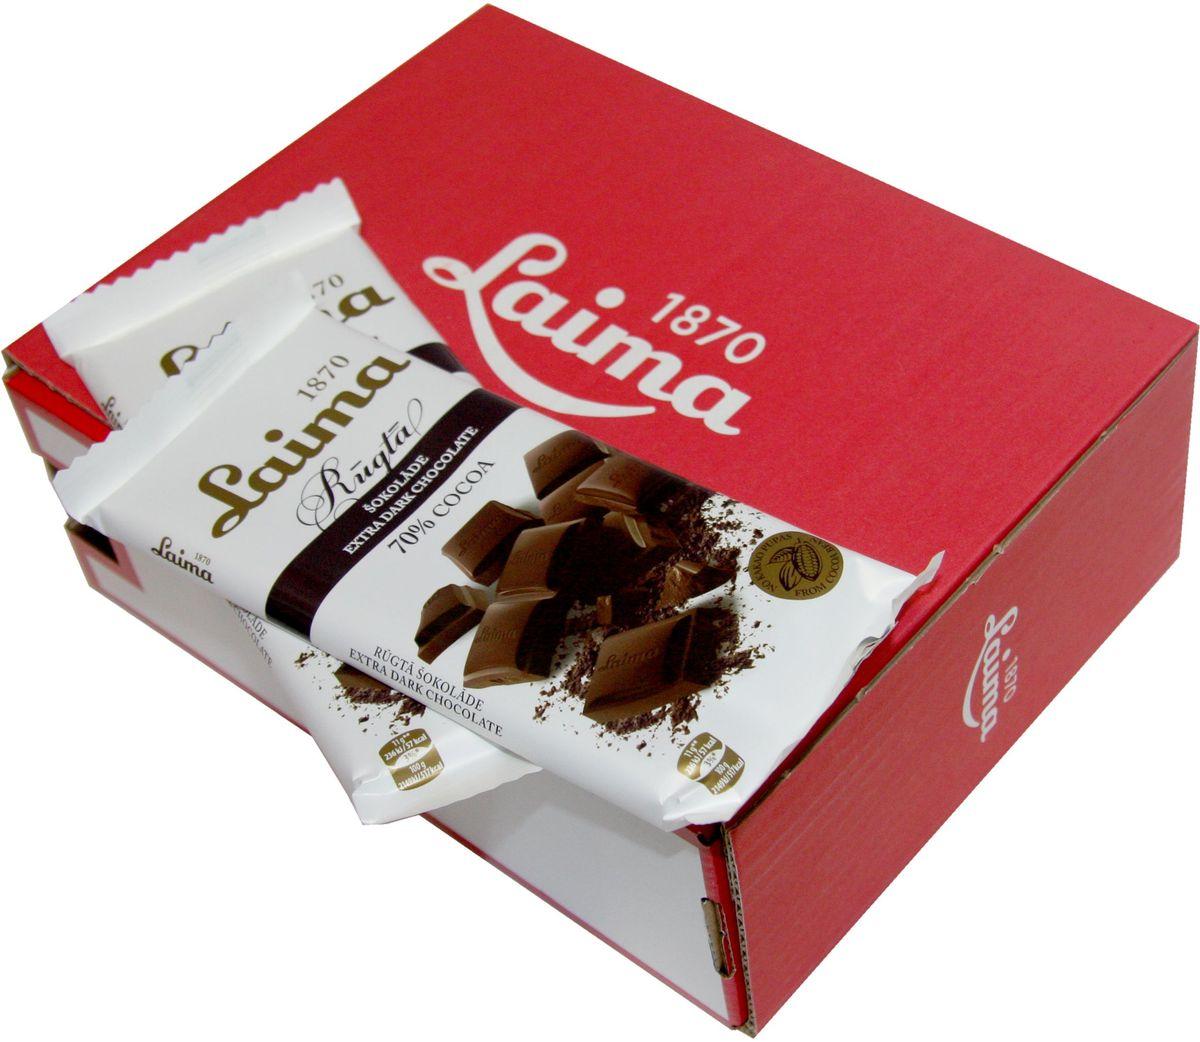 Laima Горький шоколад 70%, 100 гP120504511Классический горький шоколад .Содержание какао 70%